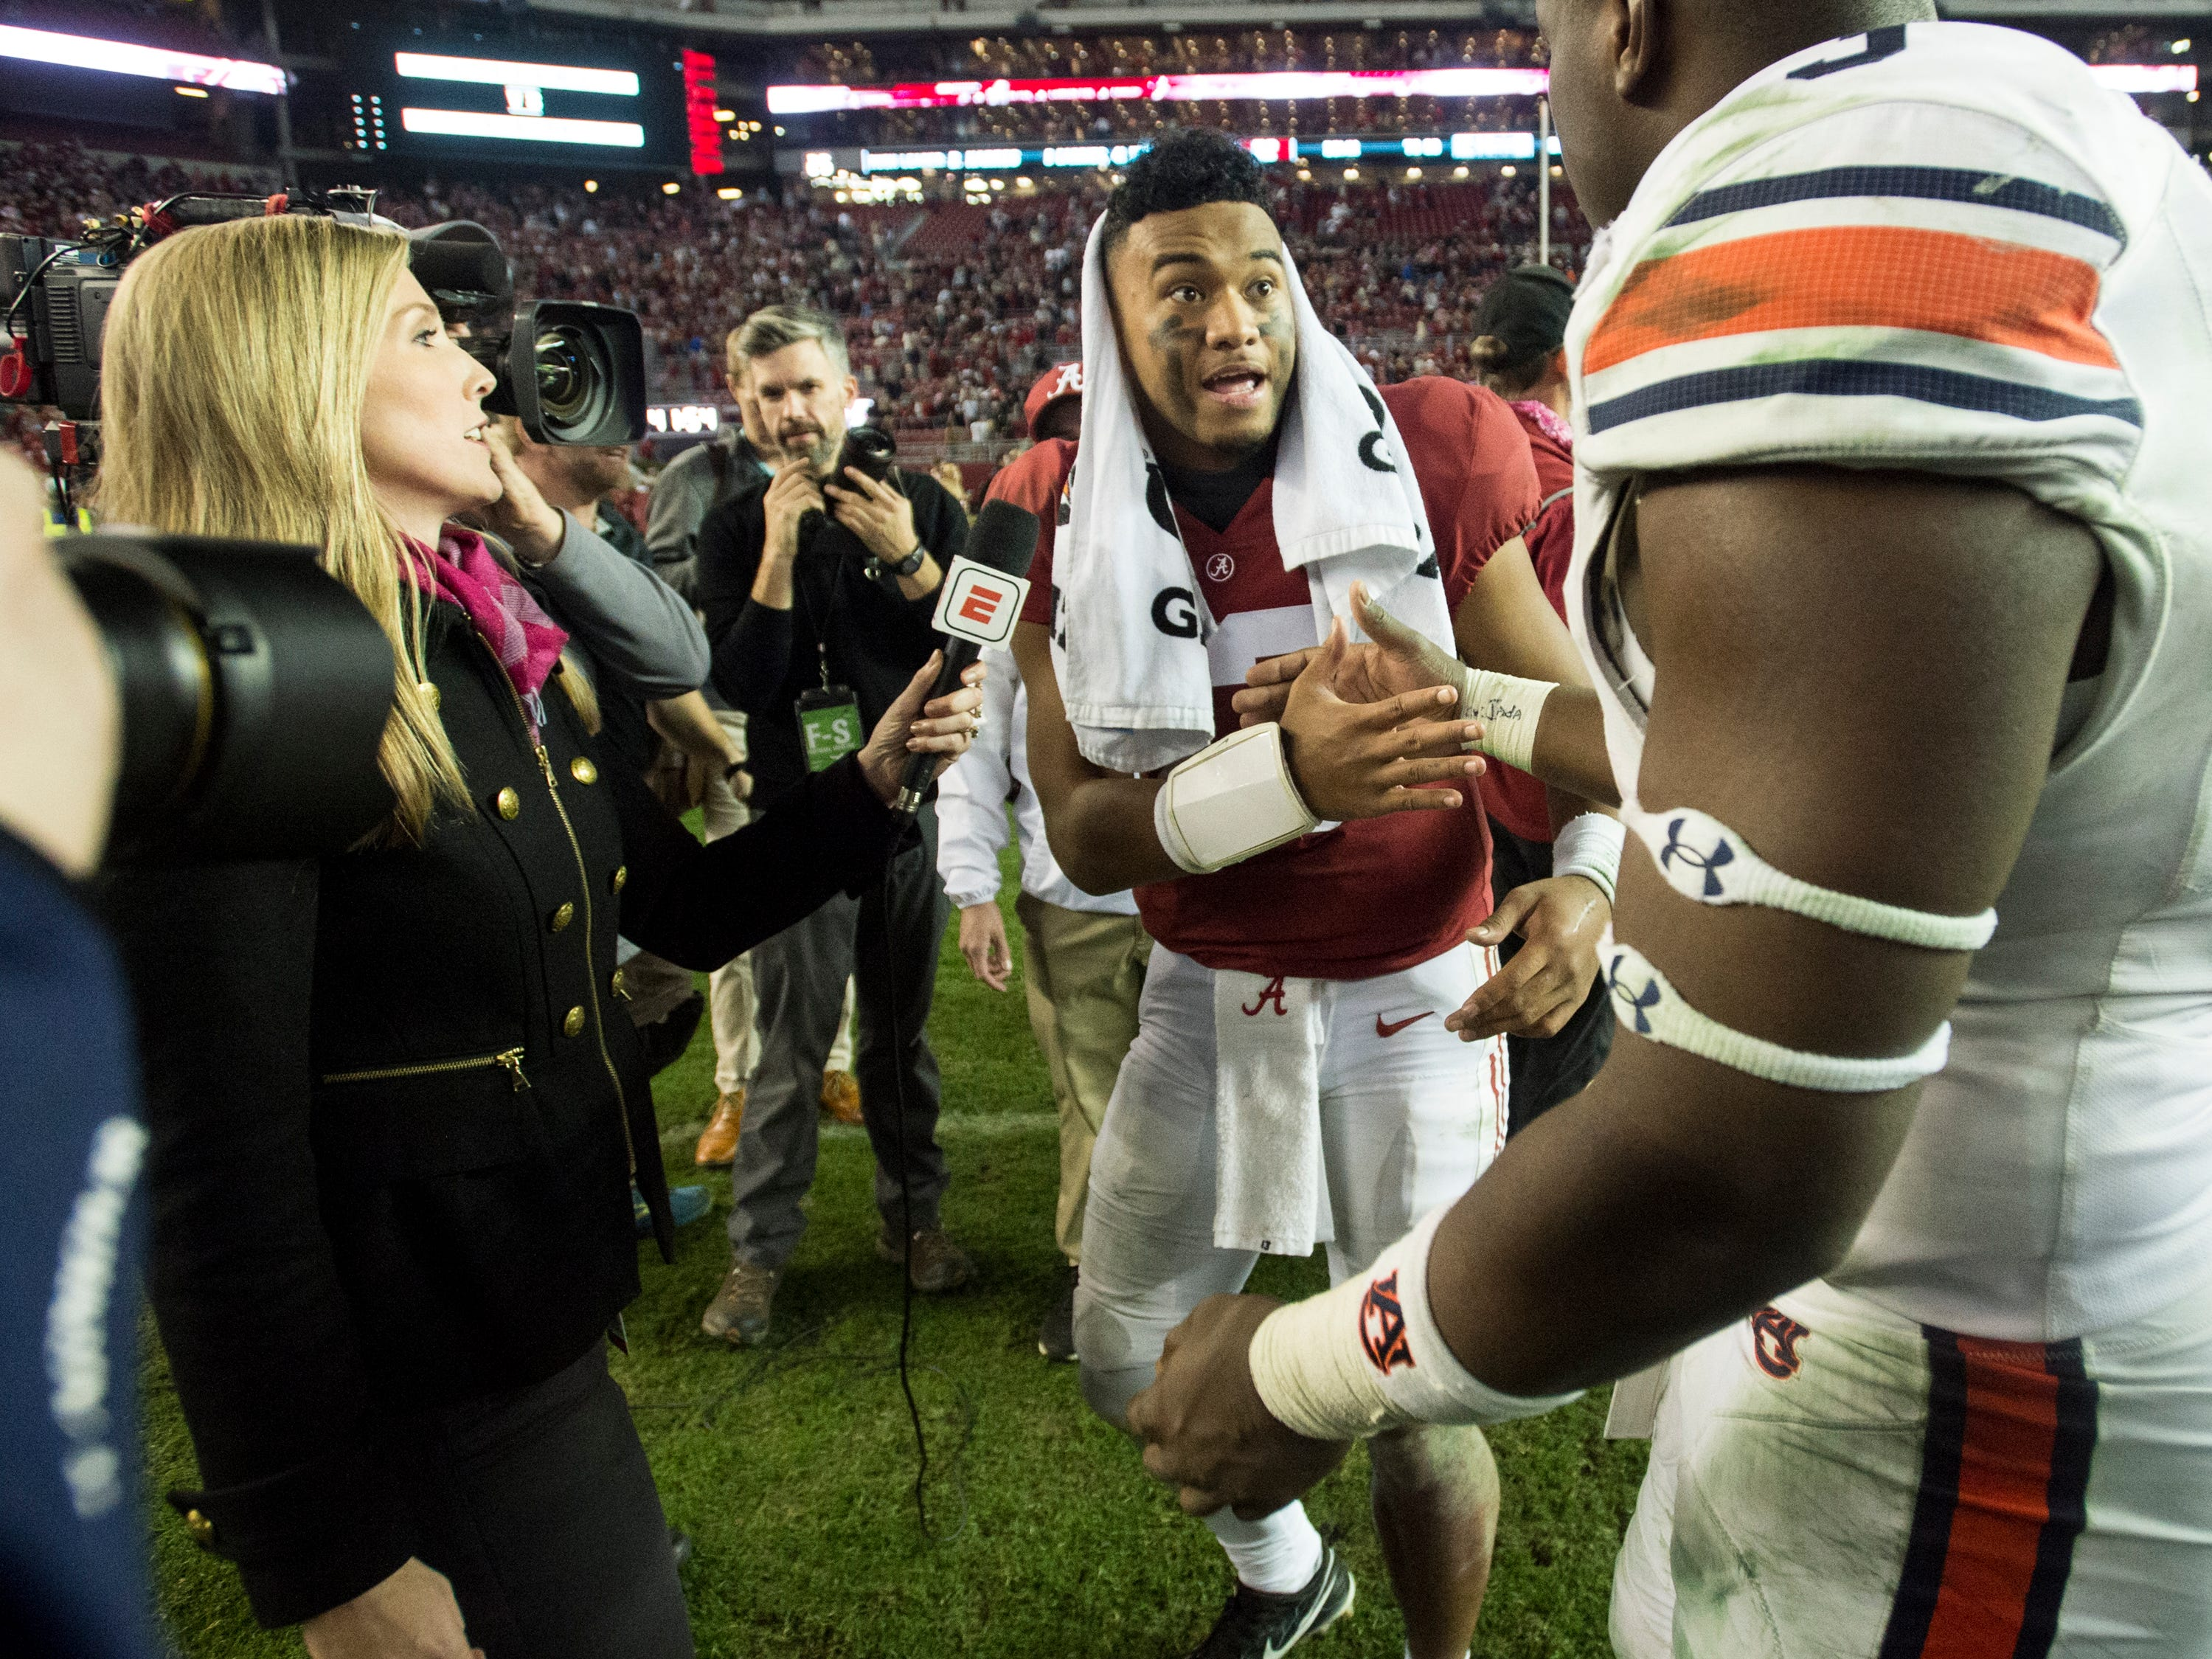 Alabama quarterback Tua Tagovailoa (13) shakes hands with Auburn defensive lineman Marlon Davidson (3) during the Iron Bowl at Bryant-Denny Stadium in Tuscaloosa, Ala., on Saturday, Nov. 24, 2018. Alabama defeated Auburn 52-21.